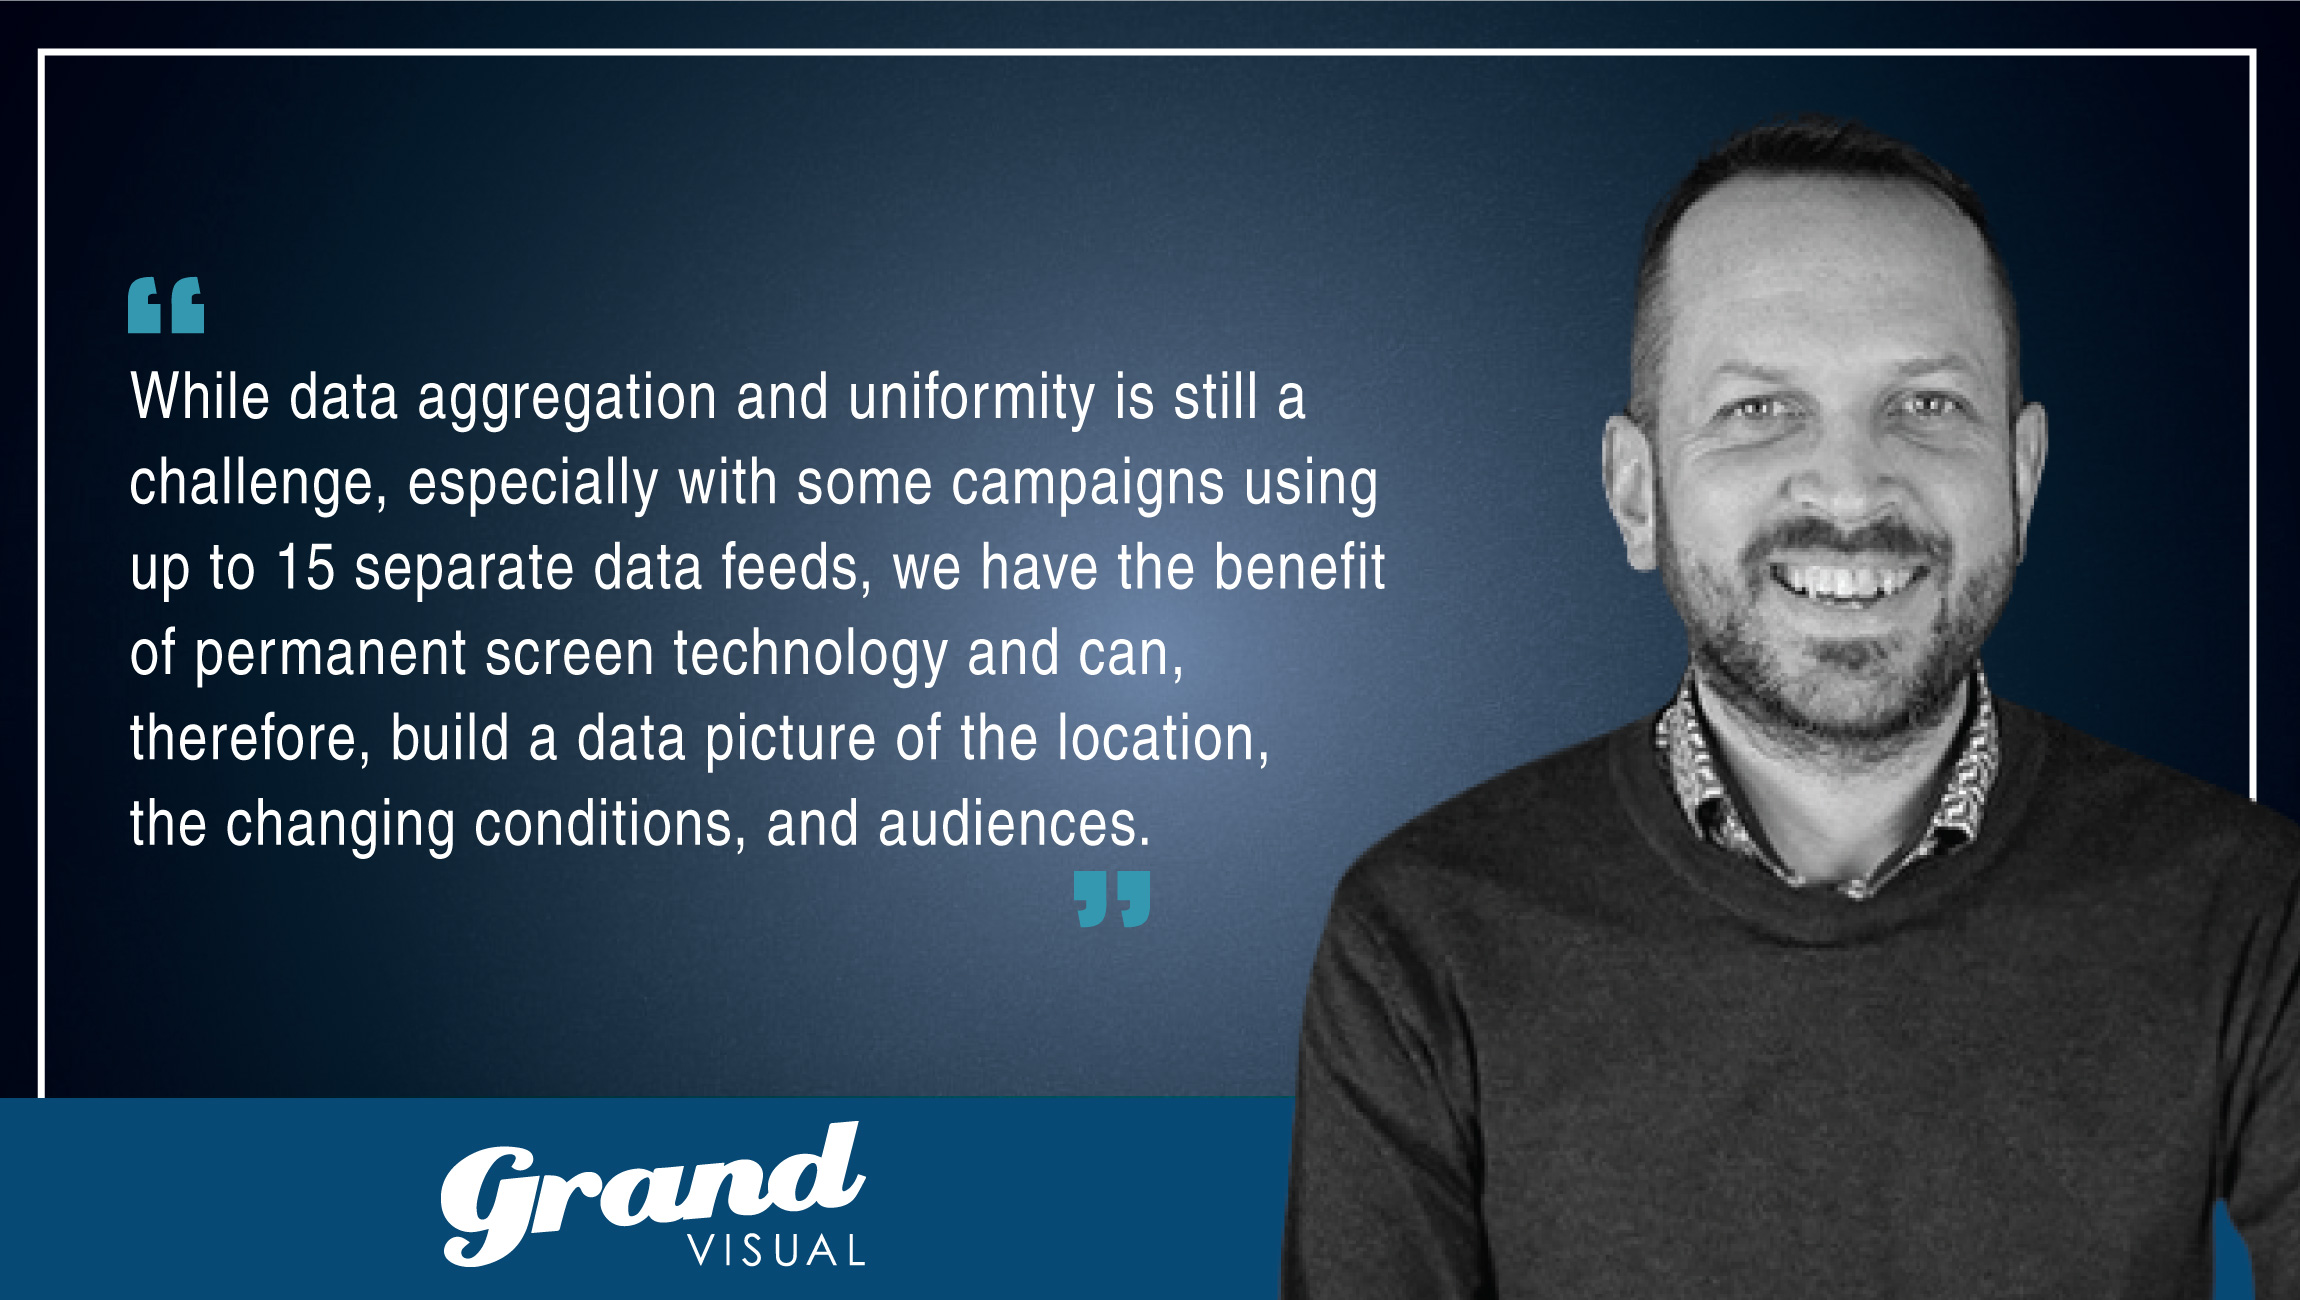 TechBytes with Daniel Dawson, CCTO, Grand Visual